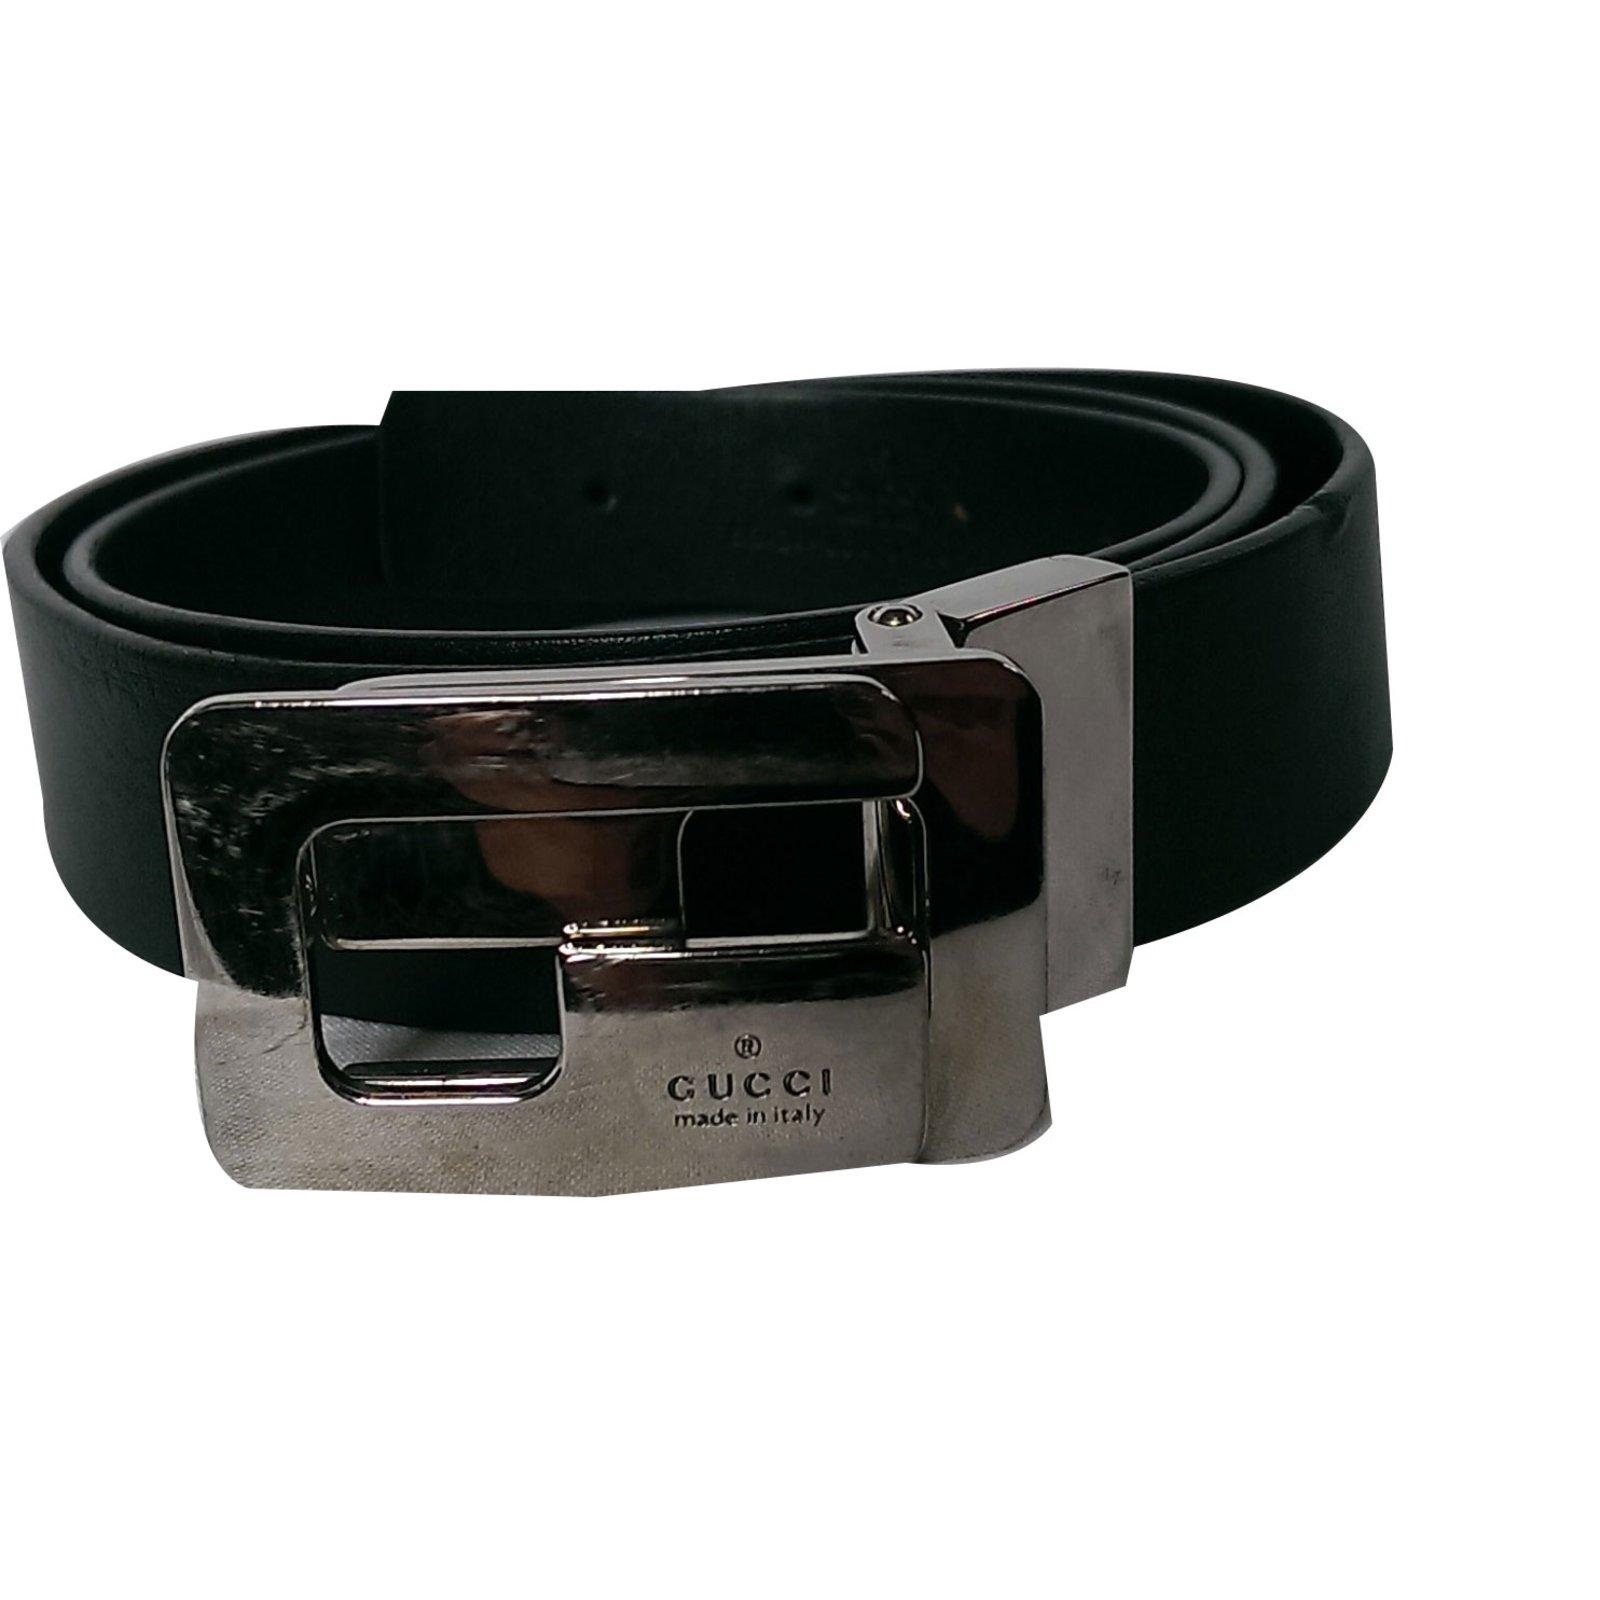 gucci mens belt belts leather black ref59026 joli closet